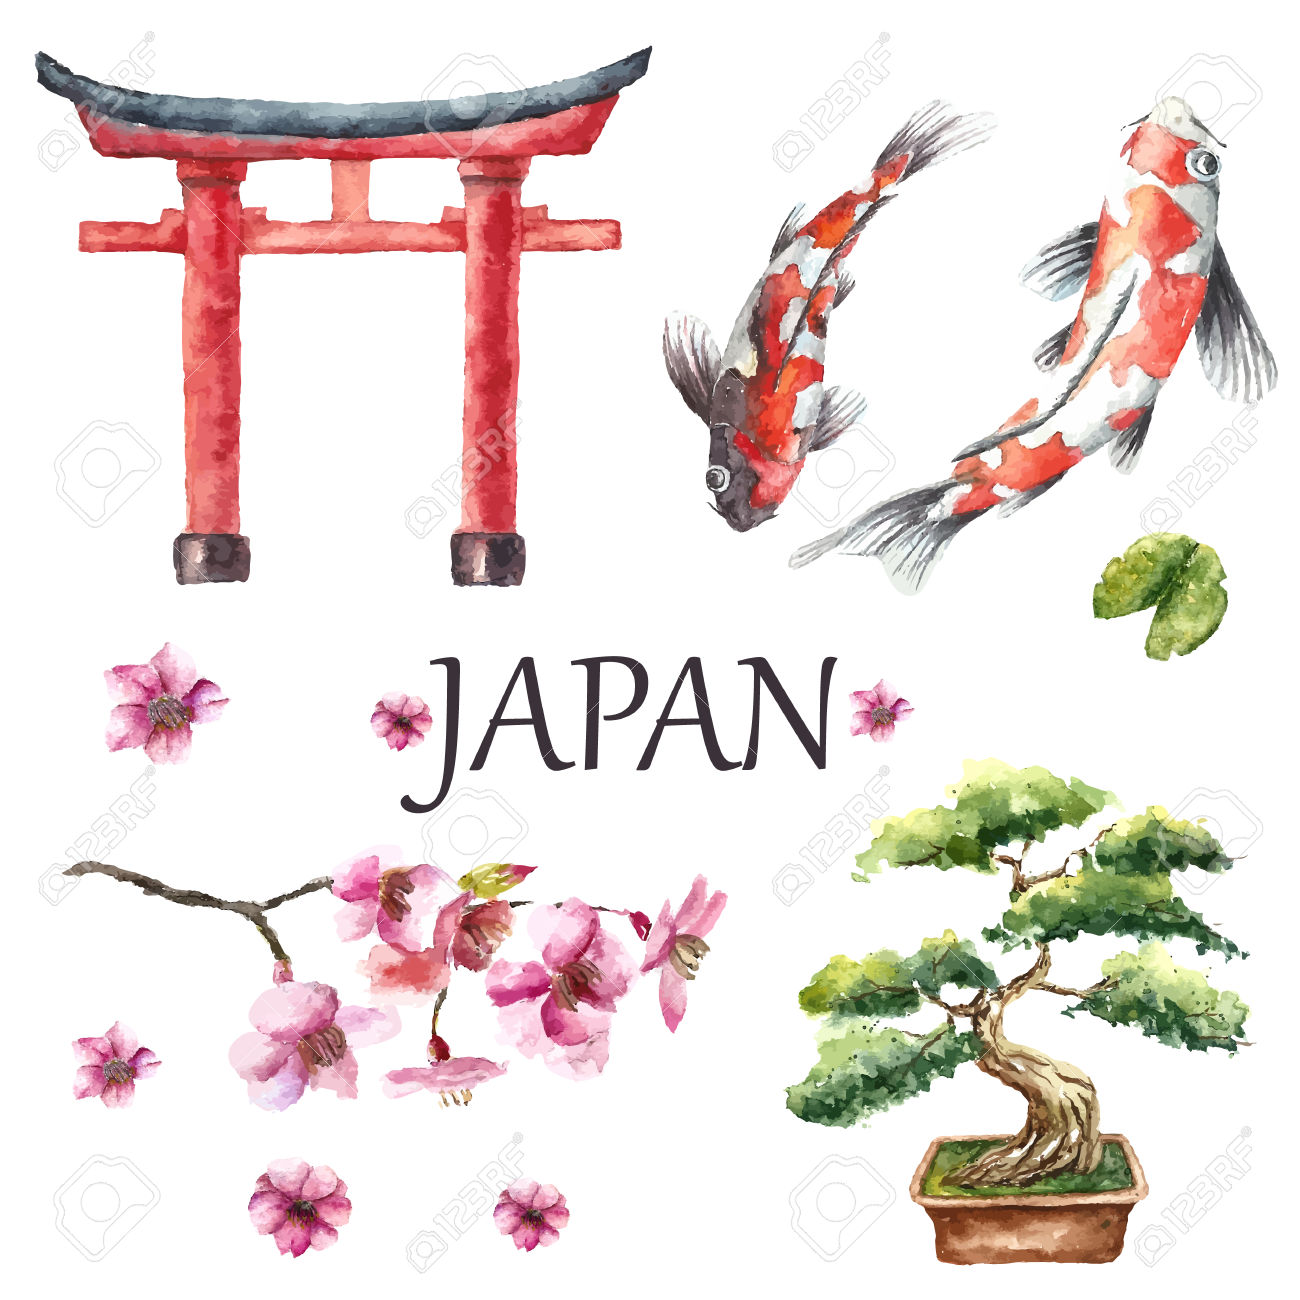 Japanese Garden clipart, Download Japanese Garden clipart ...